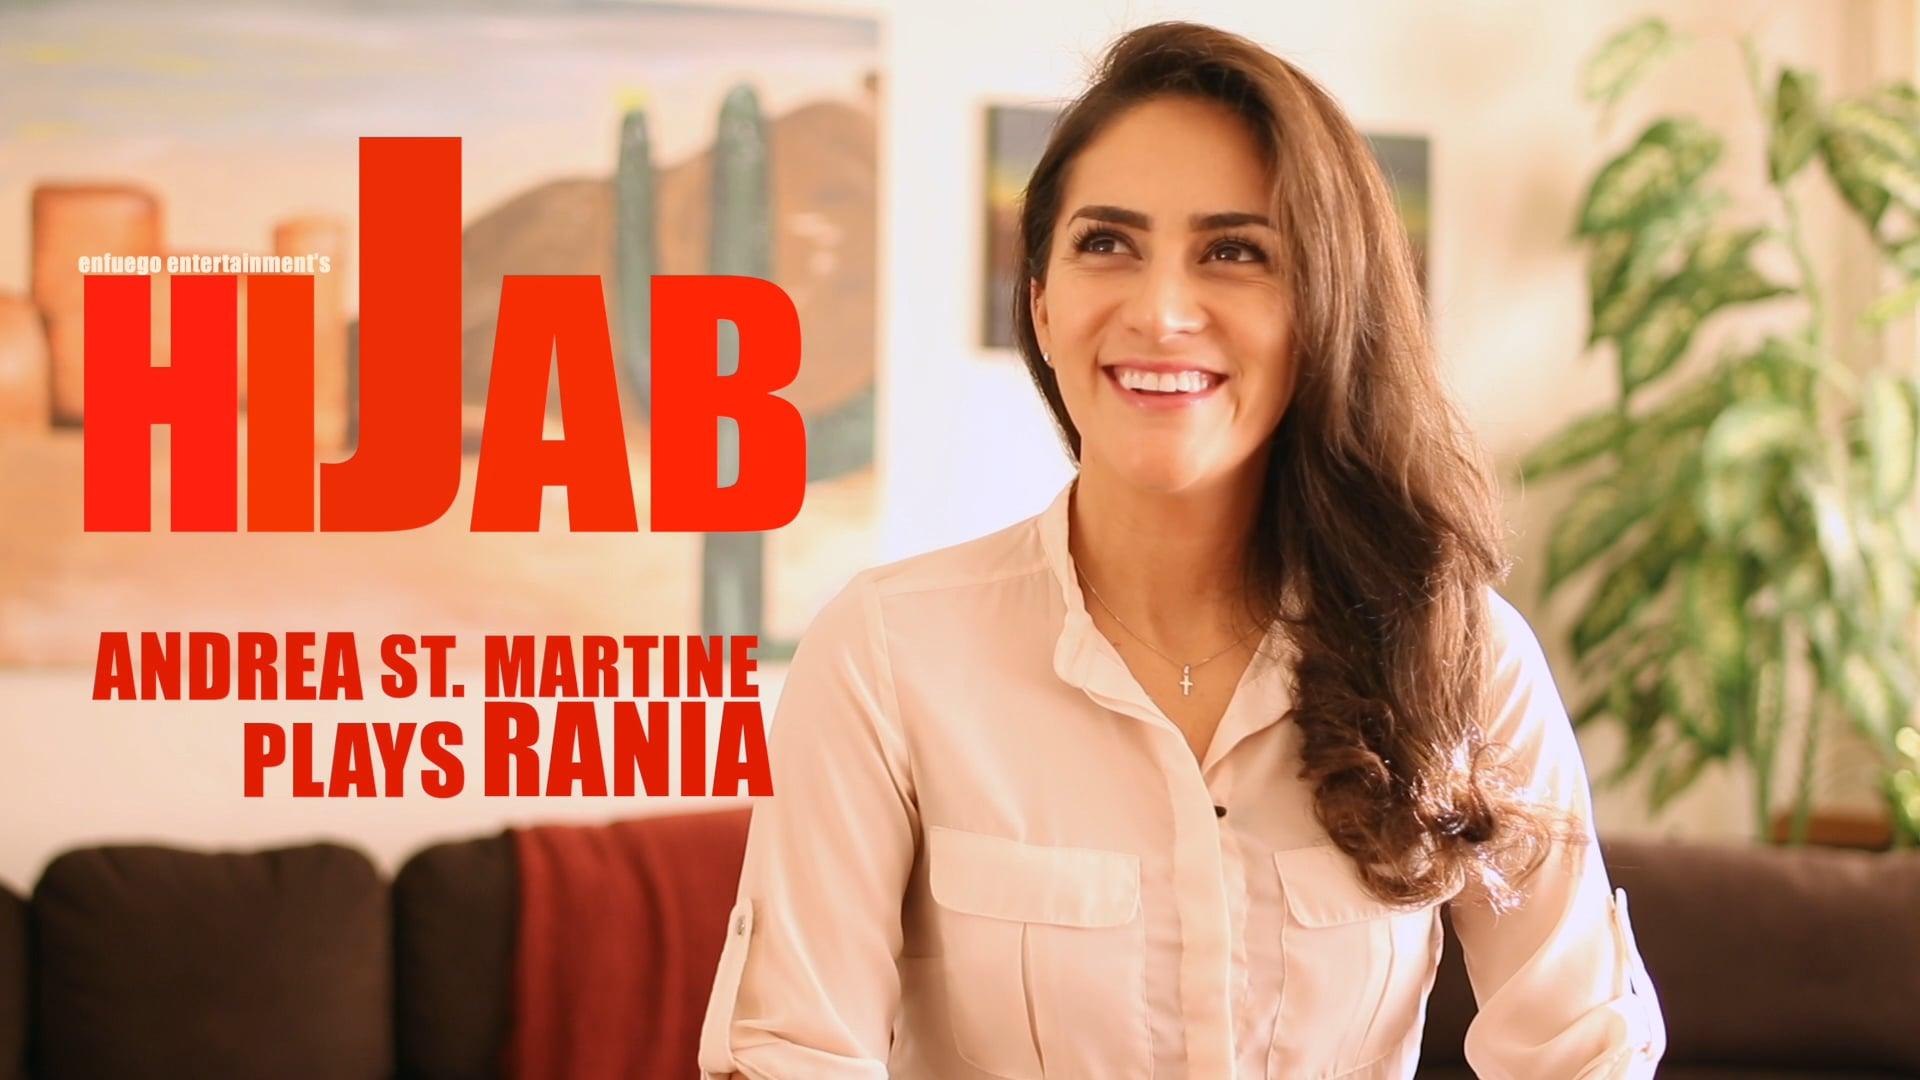 Hijab Interviews - Andrea St. Martine #1